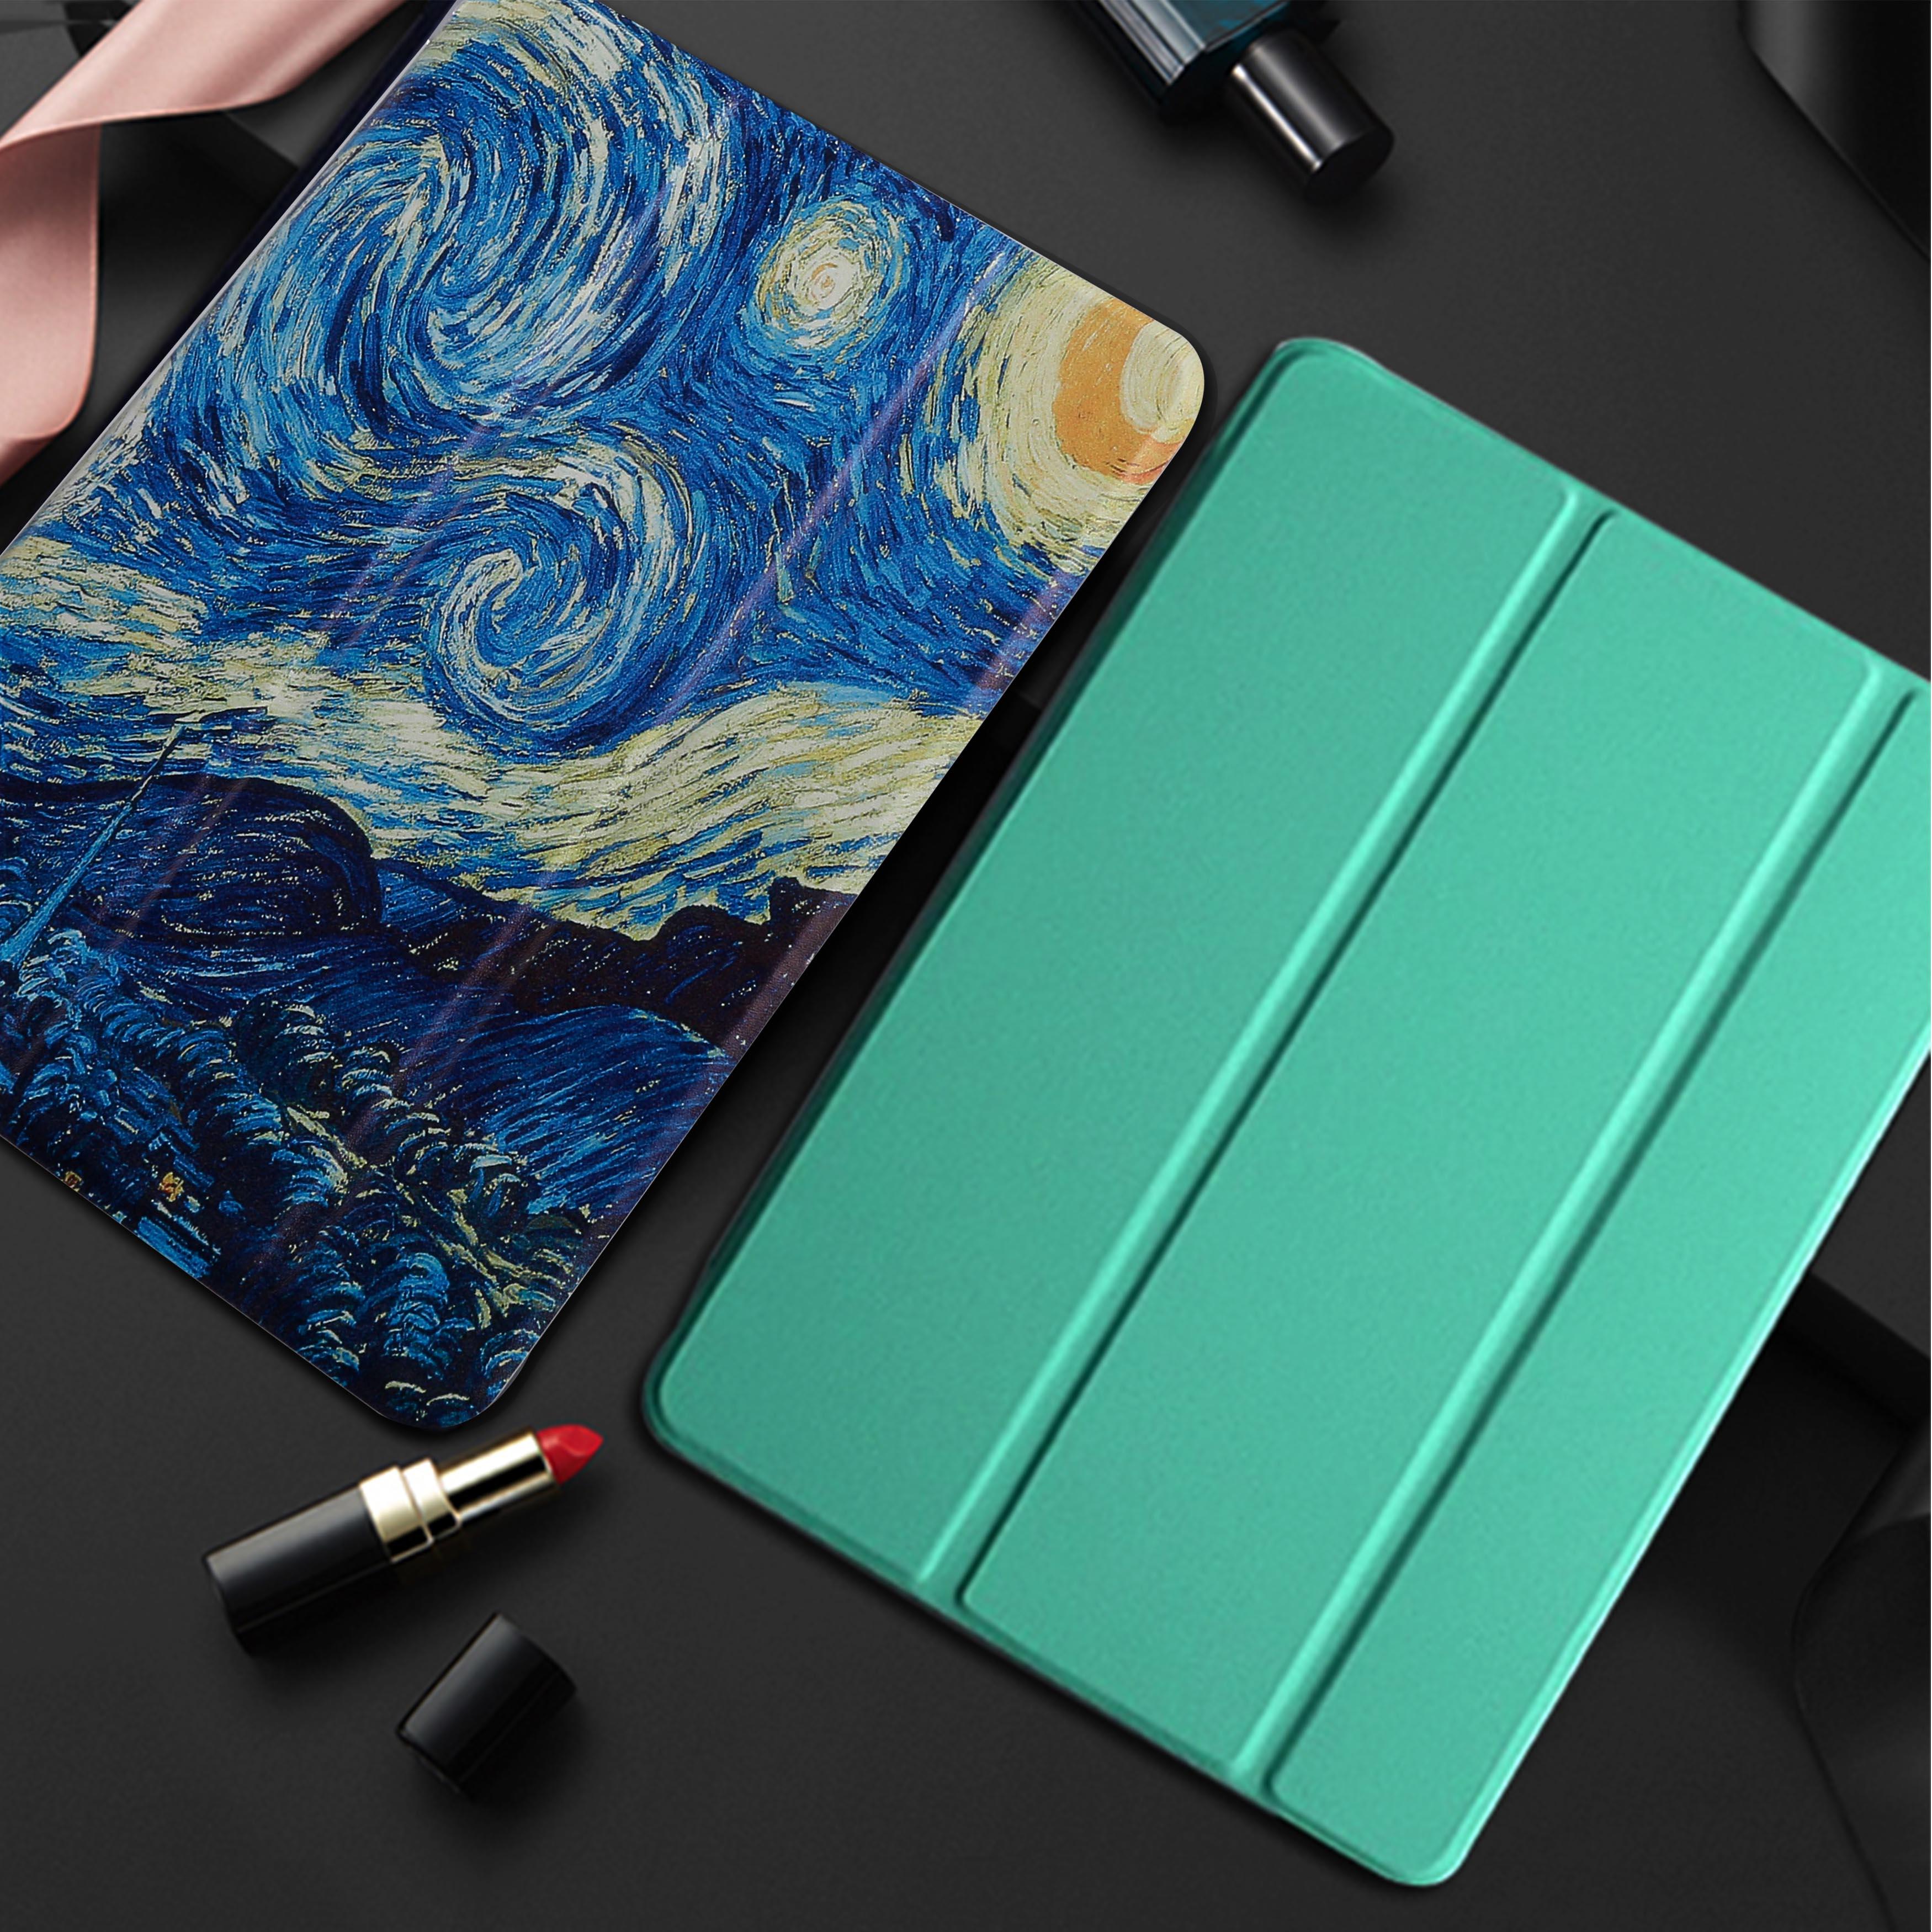 Caso para Samsung Galaxy Tab A 9,7 T550 T555 fundas Ultra Slim despertar cubierta inteligente para Galaxy Tab E 9,6 T560 T561 caso de la cubierta